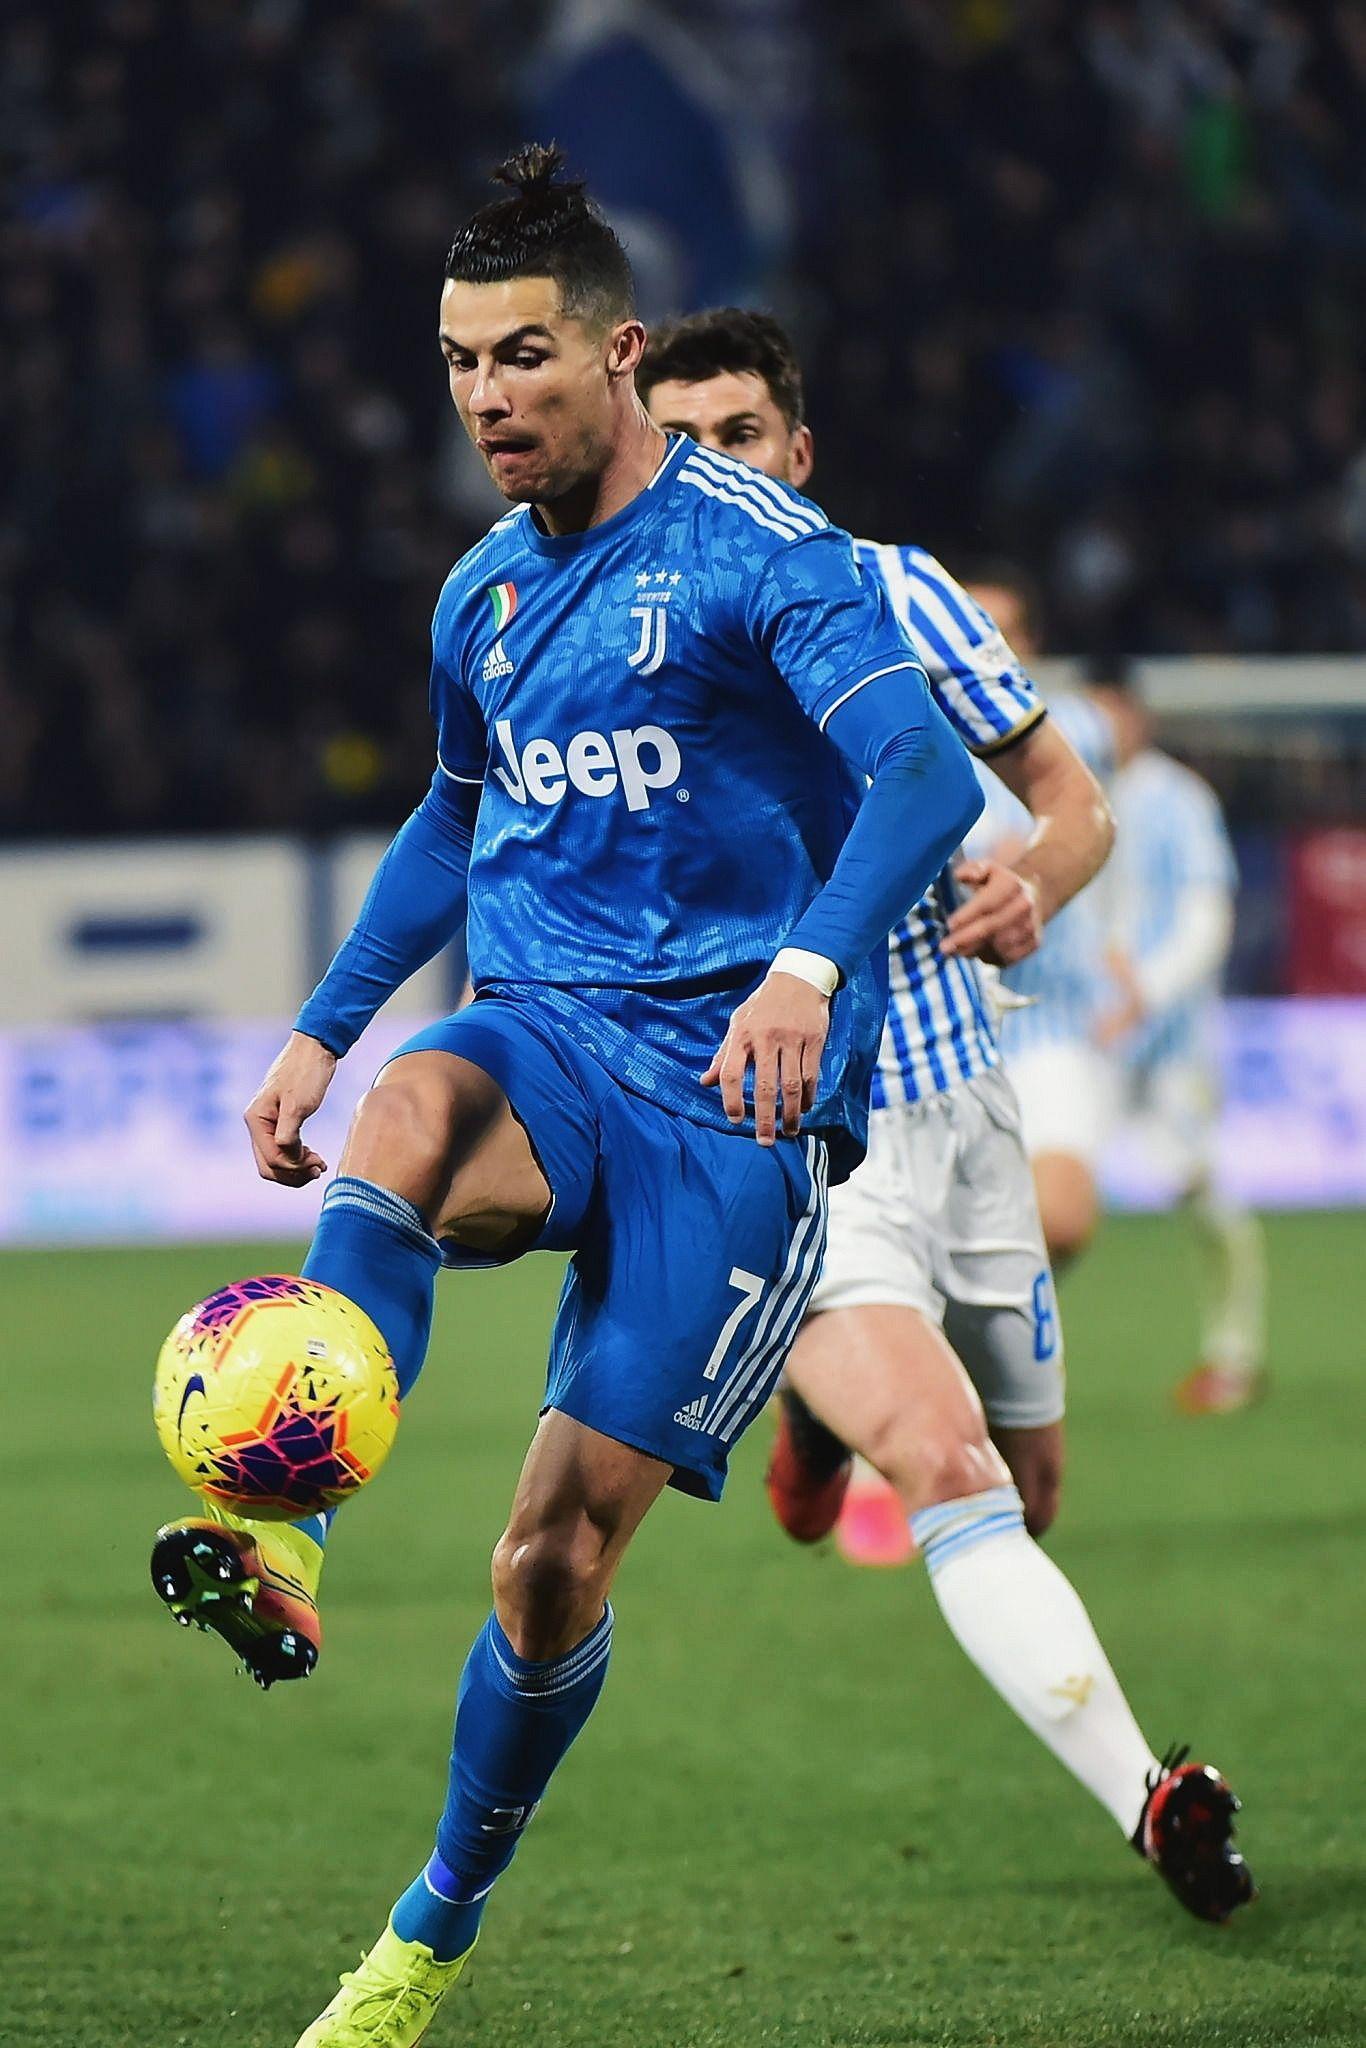 Ballinfc In 2020 Cristiano Ronaldo Cr7 Cristiano Ronaldo Ronaldo